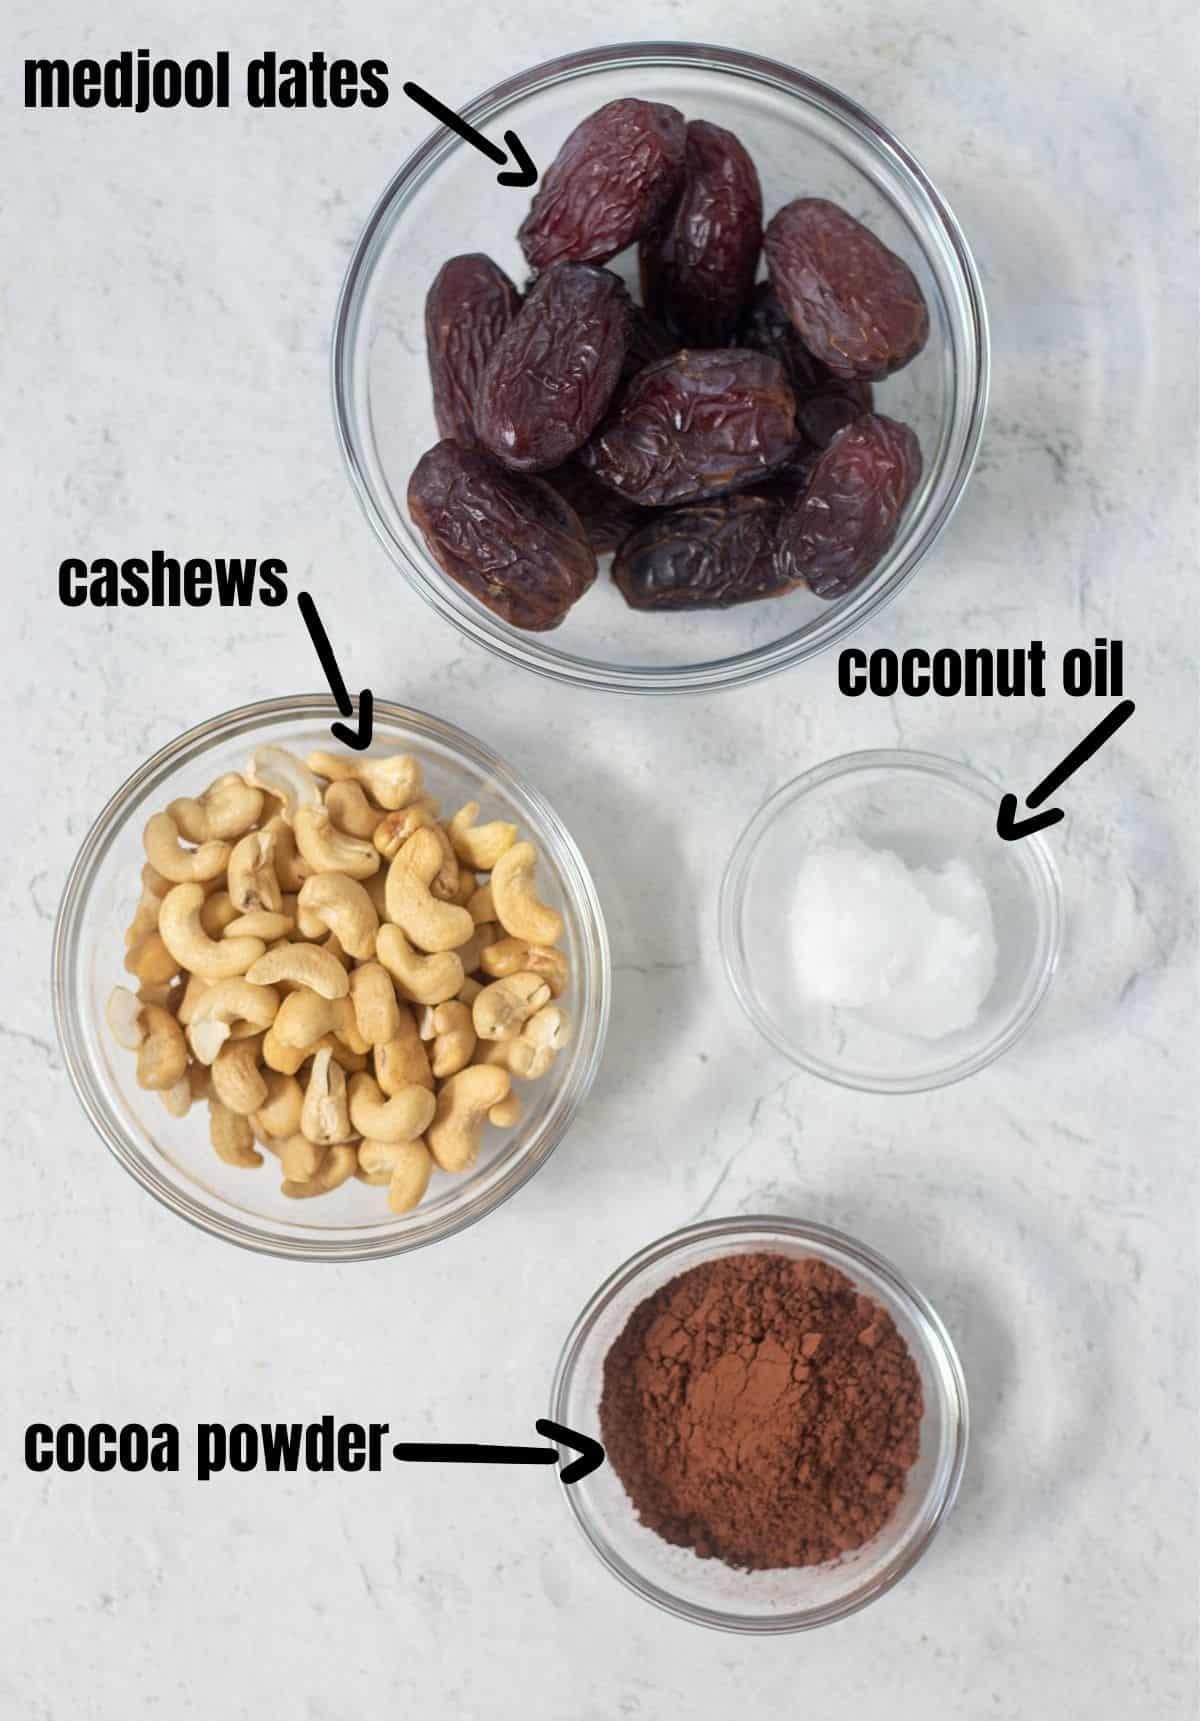 medjool dates, cashews, coconut oil, cocoa powder